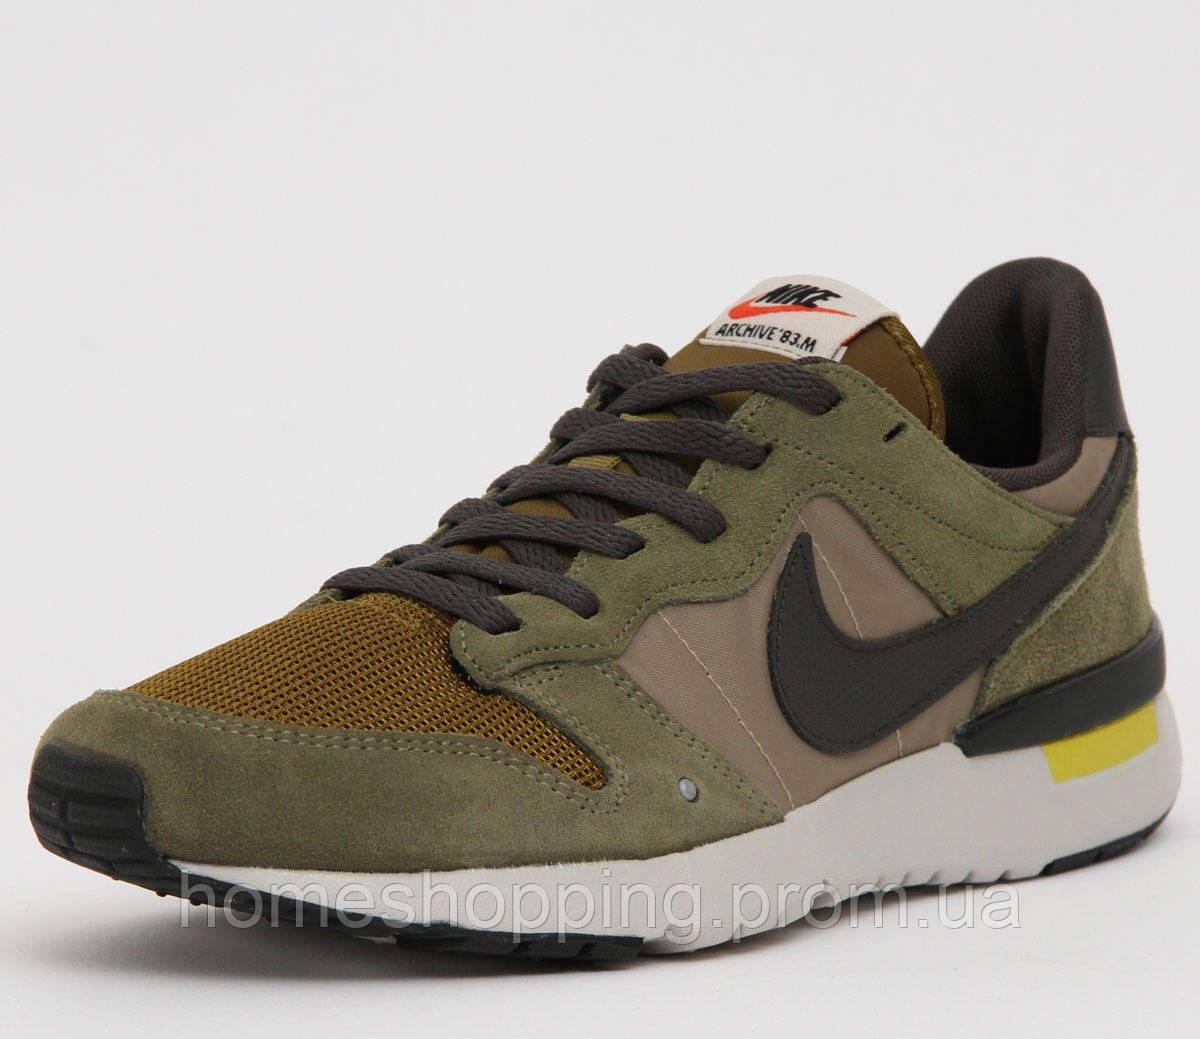 Кроссовки Nike Archive ´83.M Medium Olive